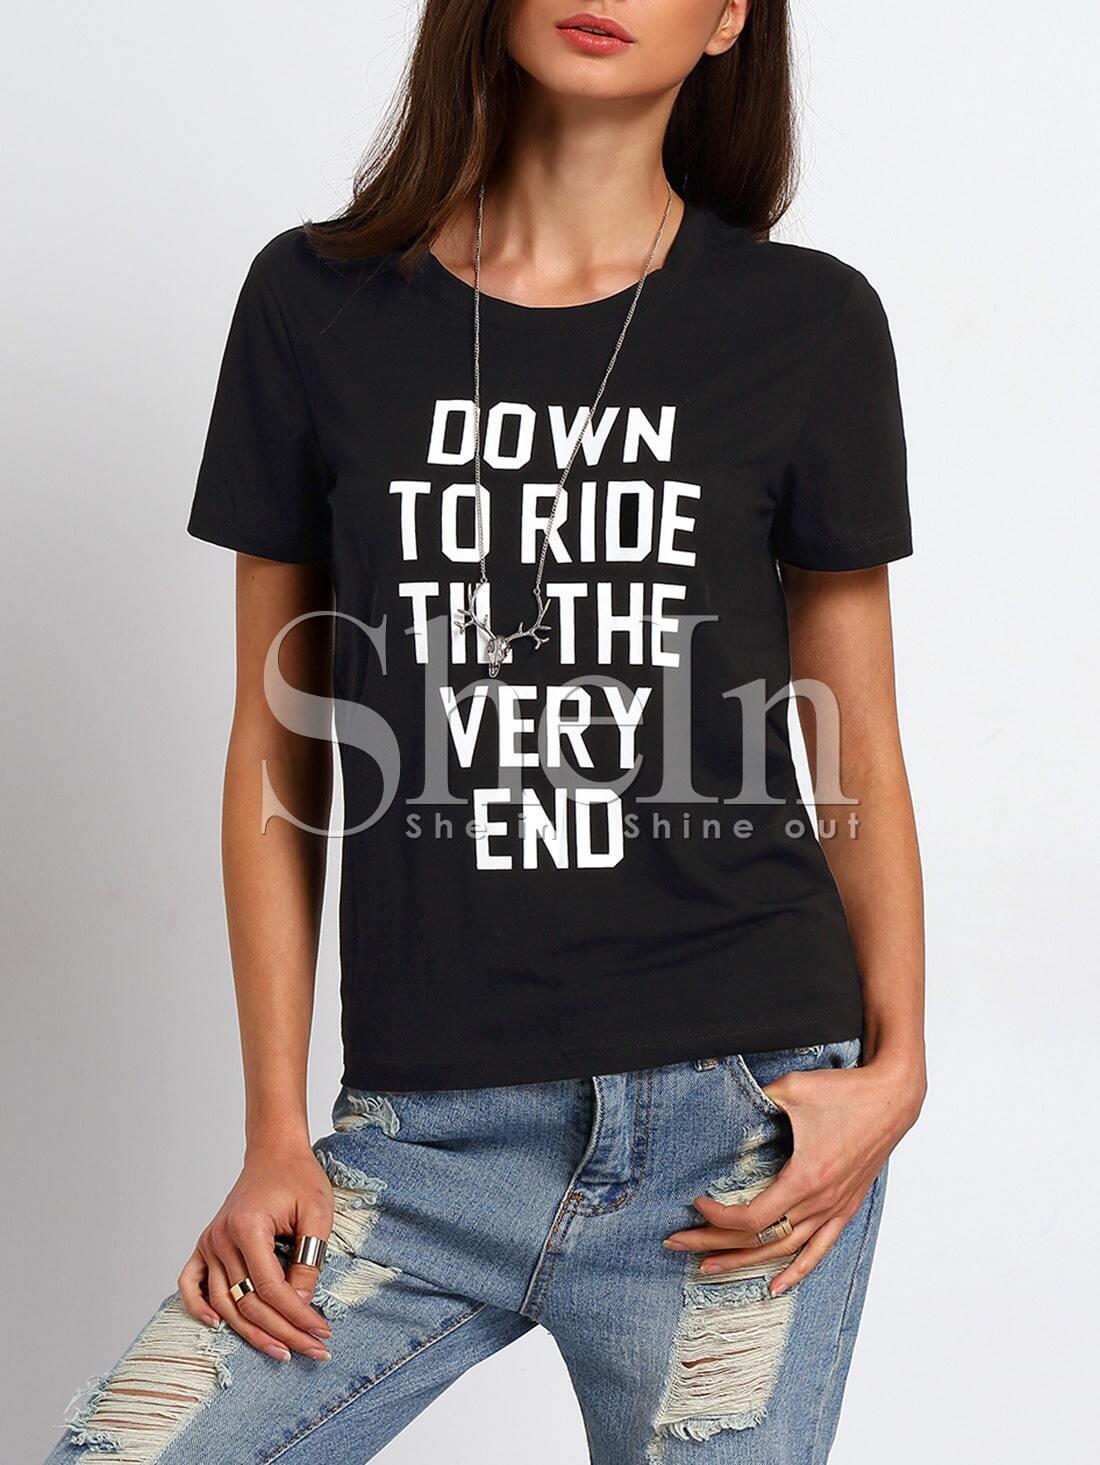 Best pairlook BONNIE & CLYDE t-shirt